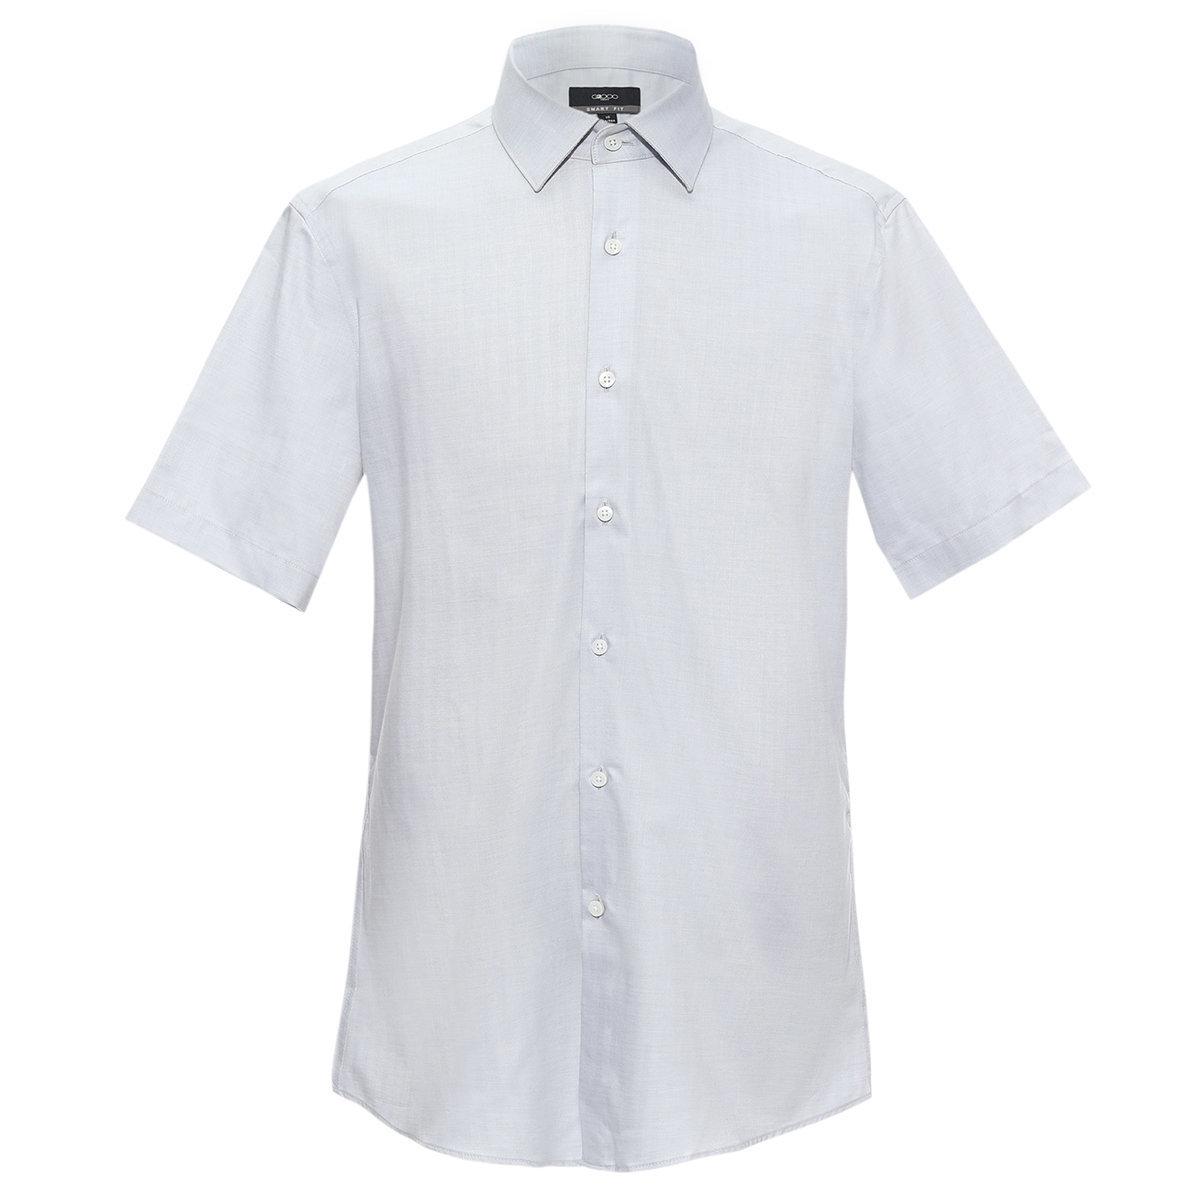 Men's Cotton Short Sleeve Shirt(grey)